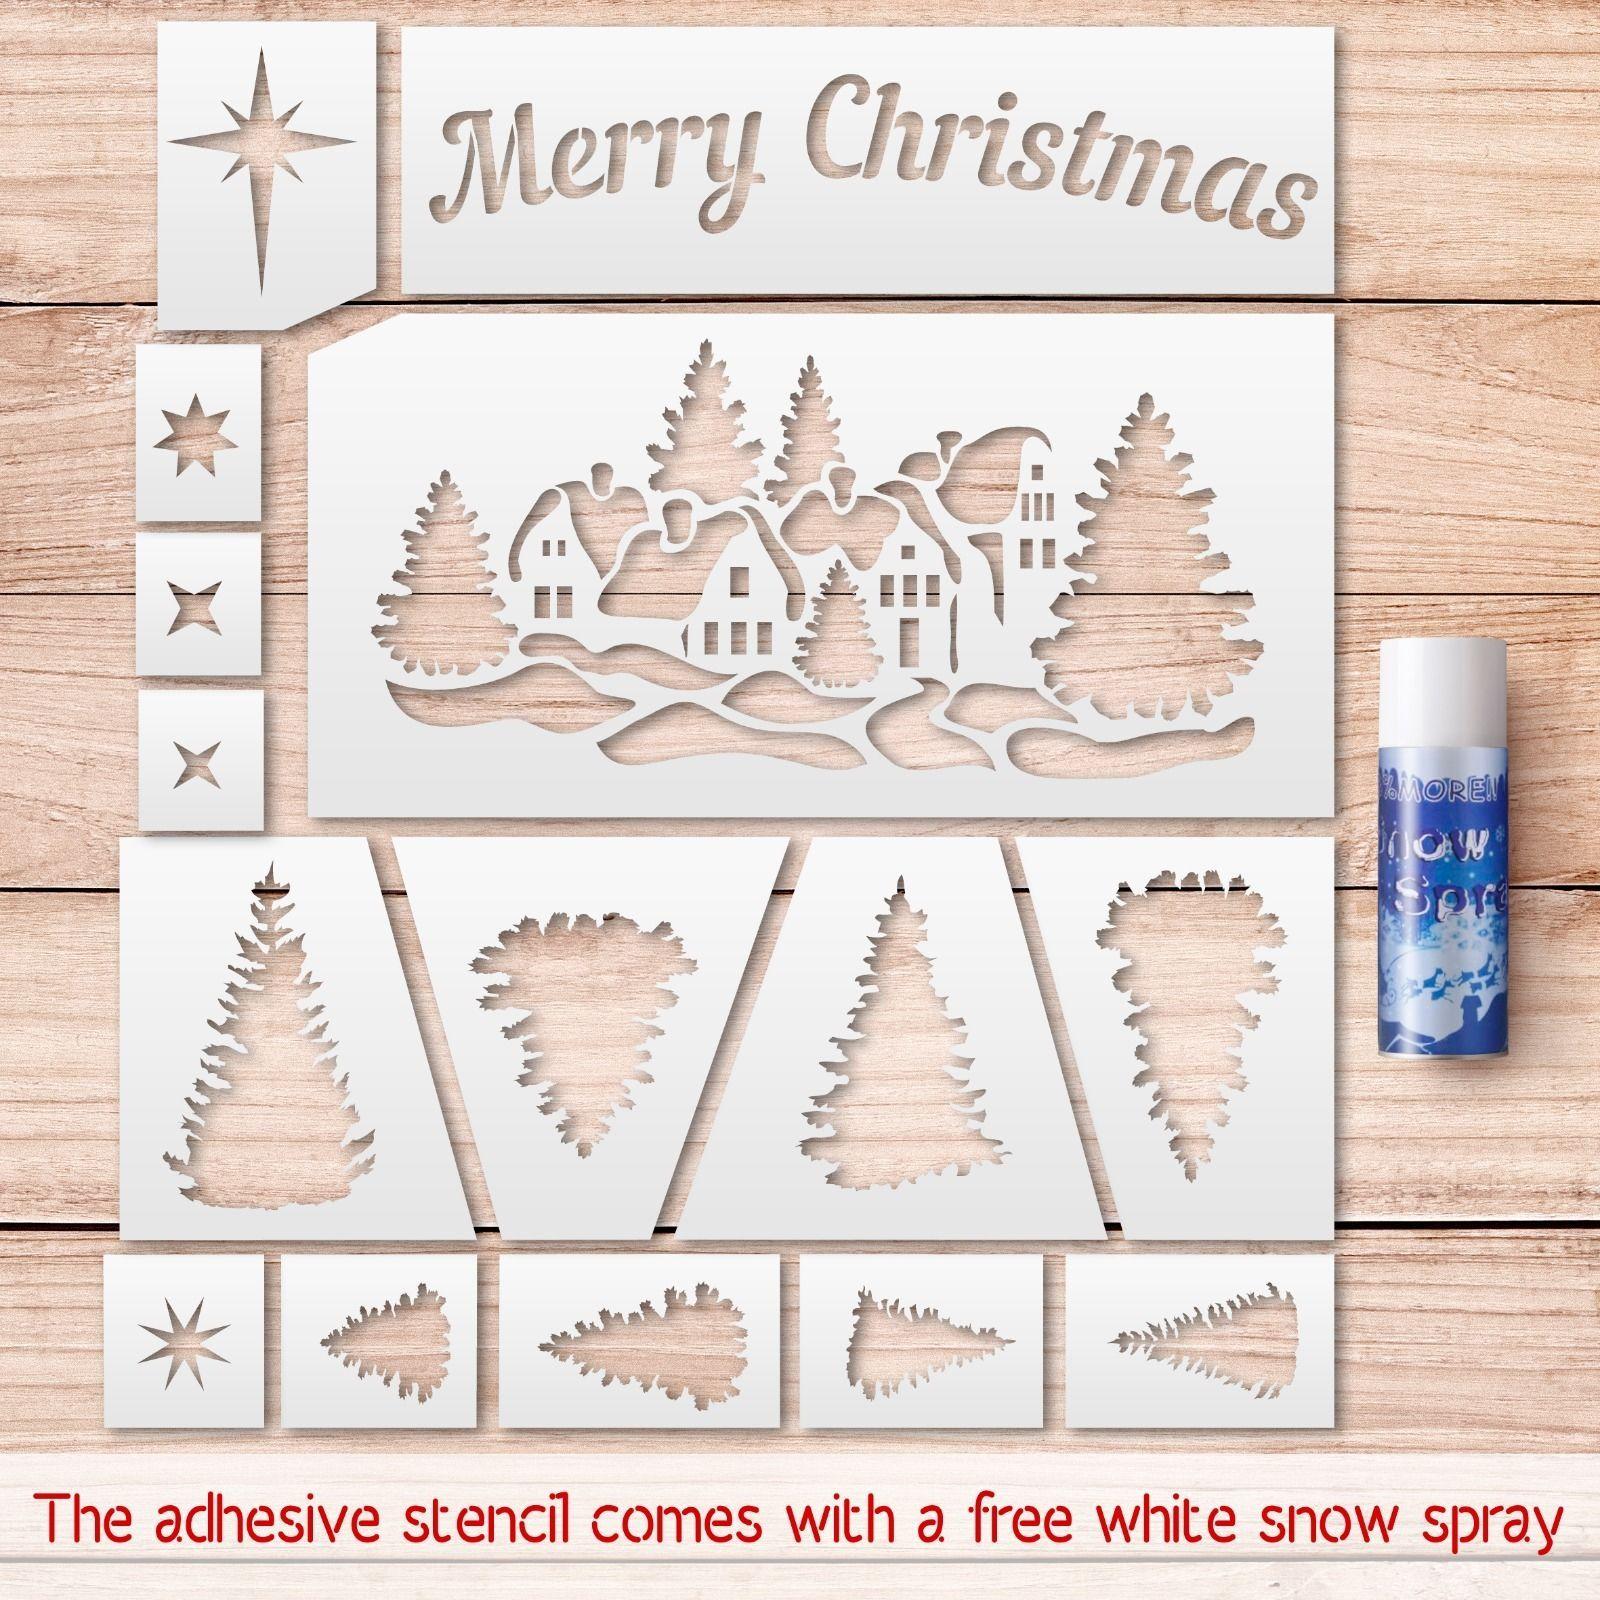 Merry christmas stencils kit stencils for windows decoration free snow spray ebay